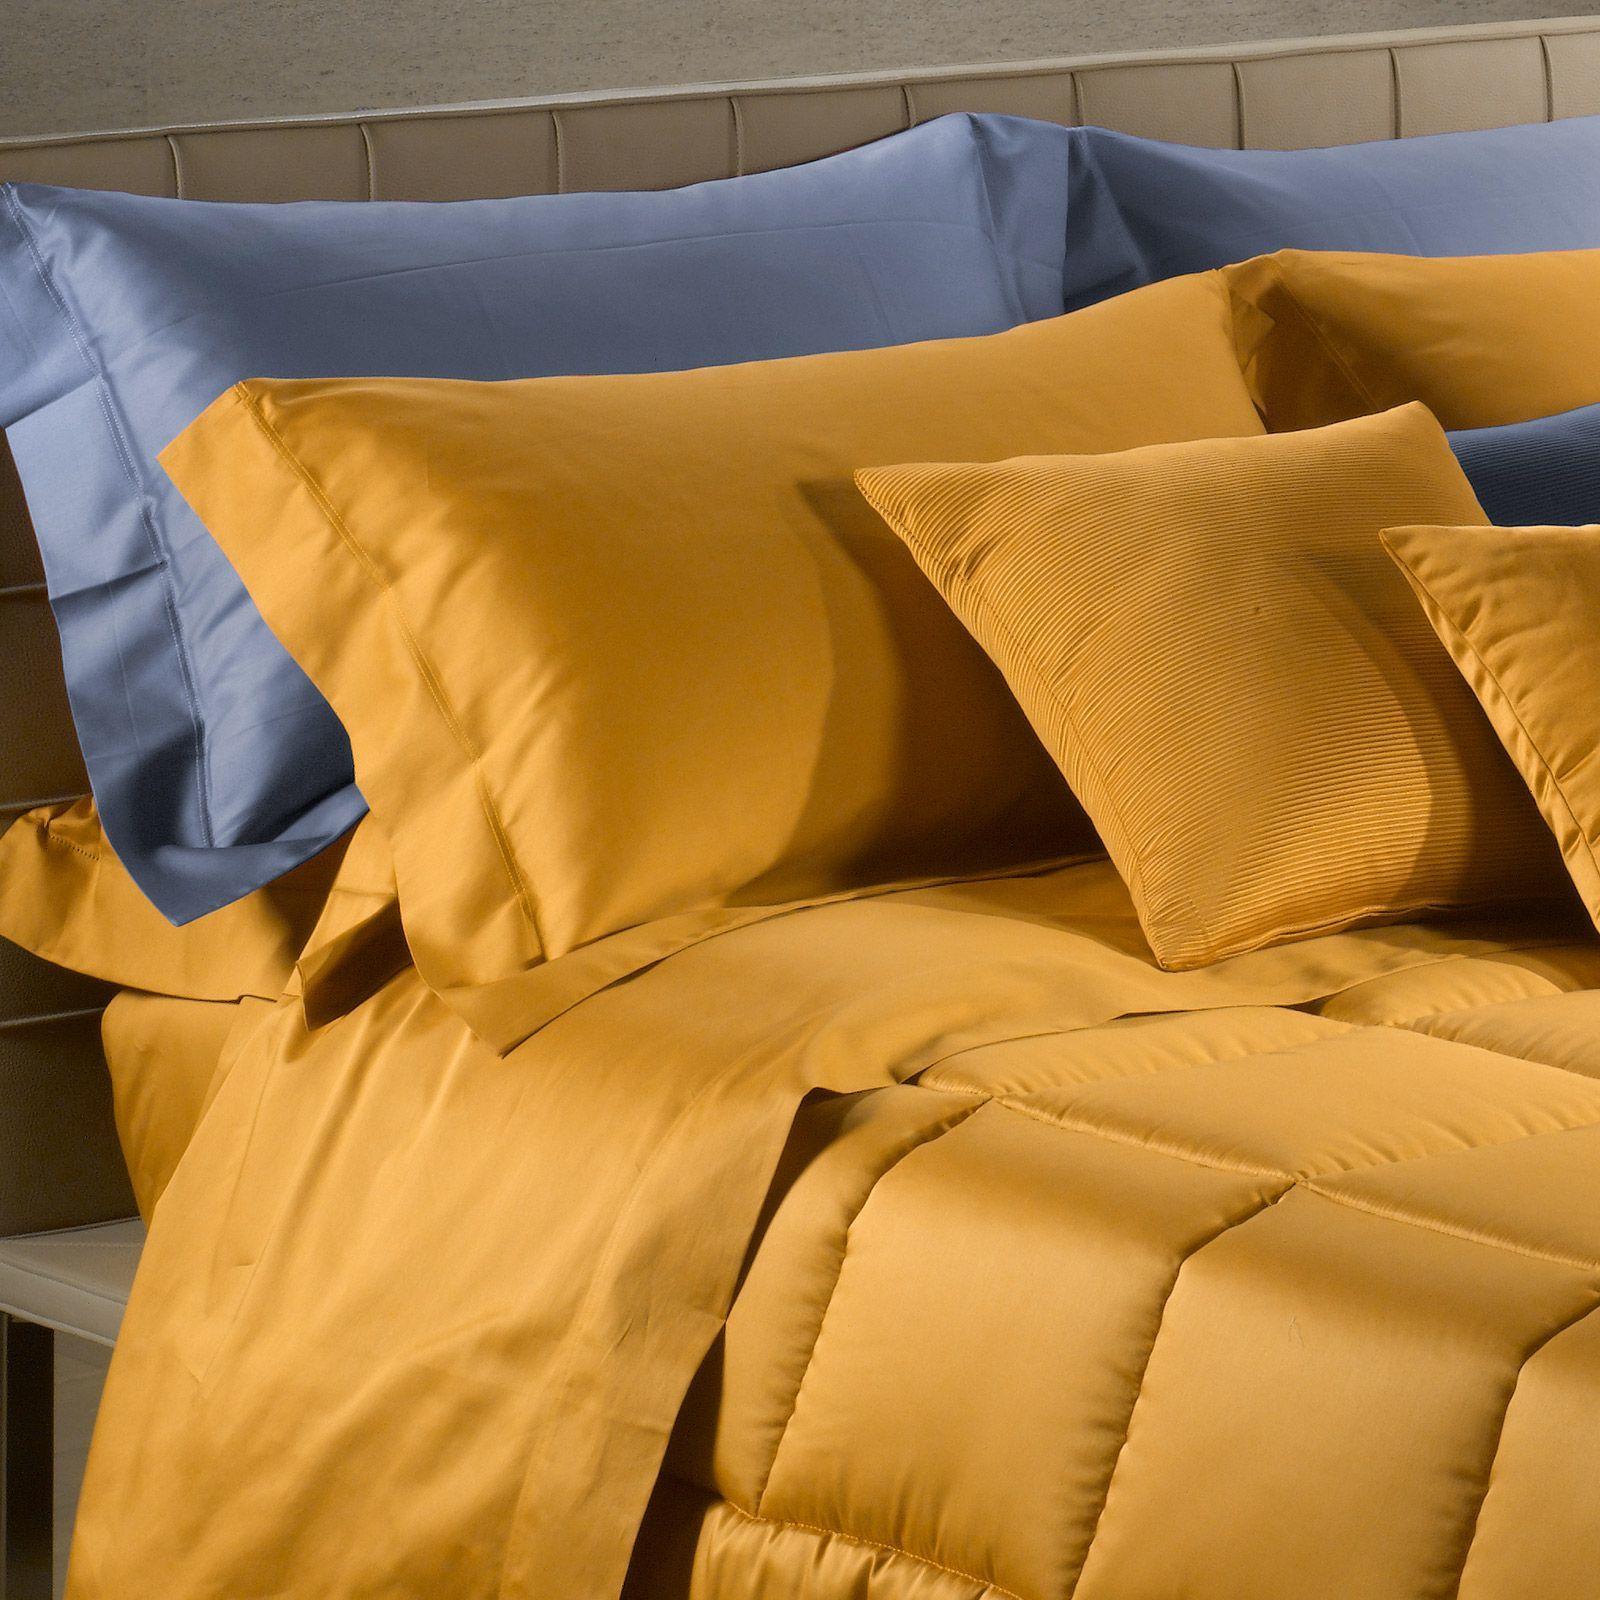 Наволочки для сна Наволочки 2шт 70x70 Caleffi Raso Tinta Unito золотые komplekt-navolochek-50x70-caleffi-raso-tinta-unito-zolotoy-italiya.jpg